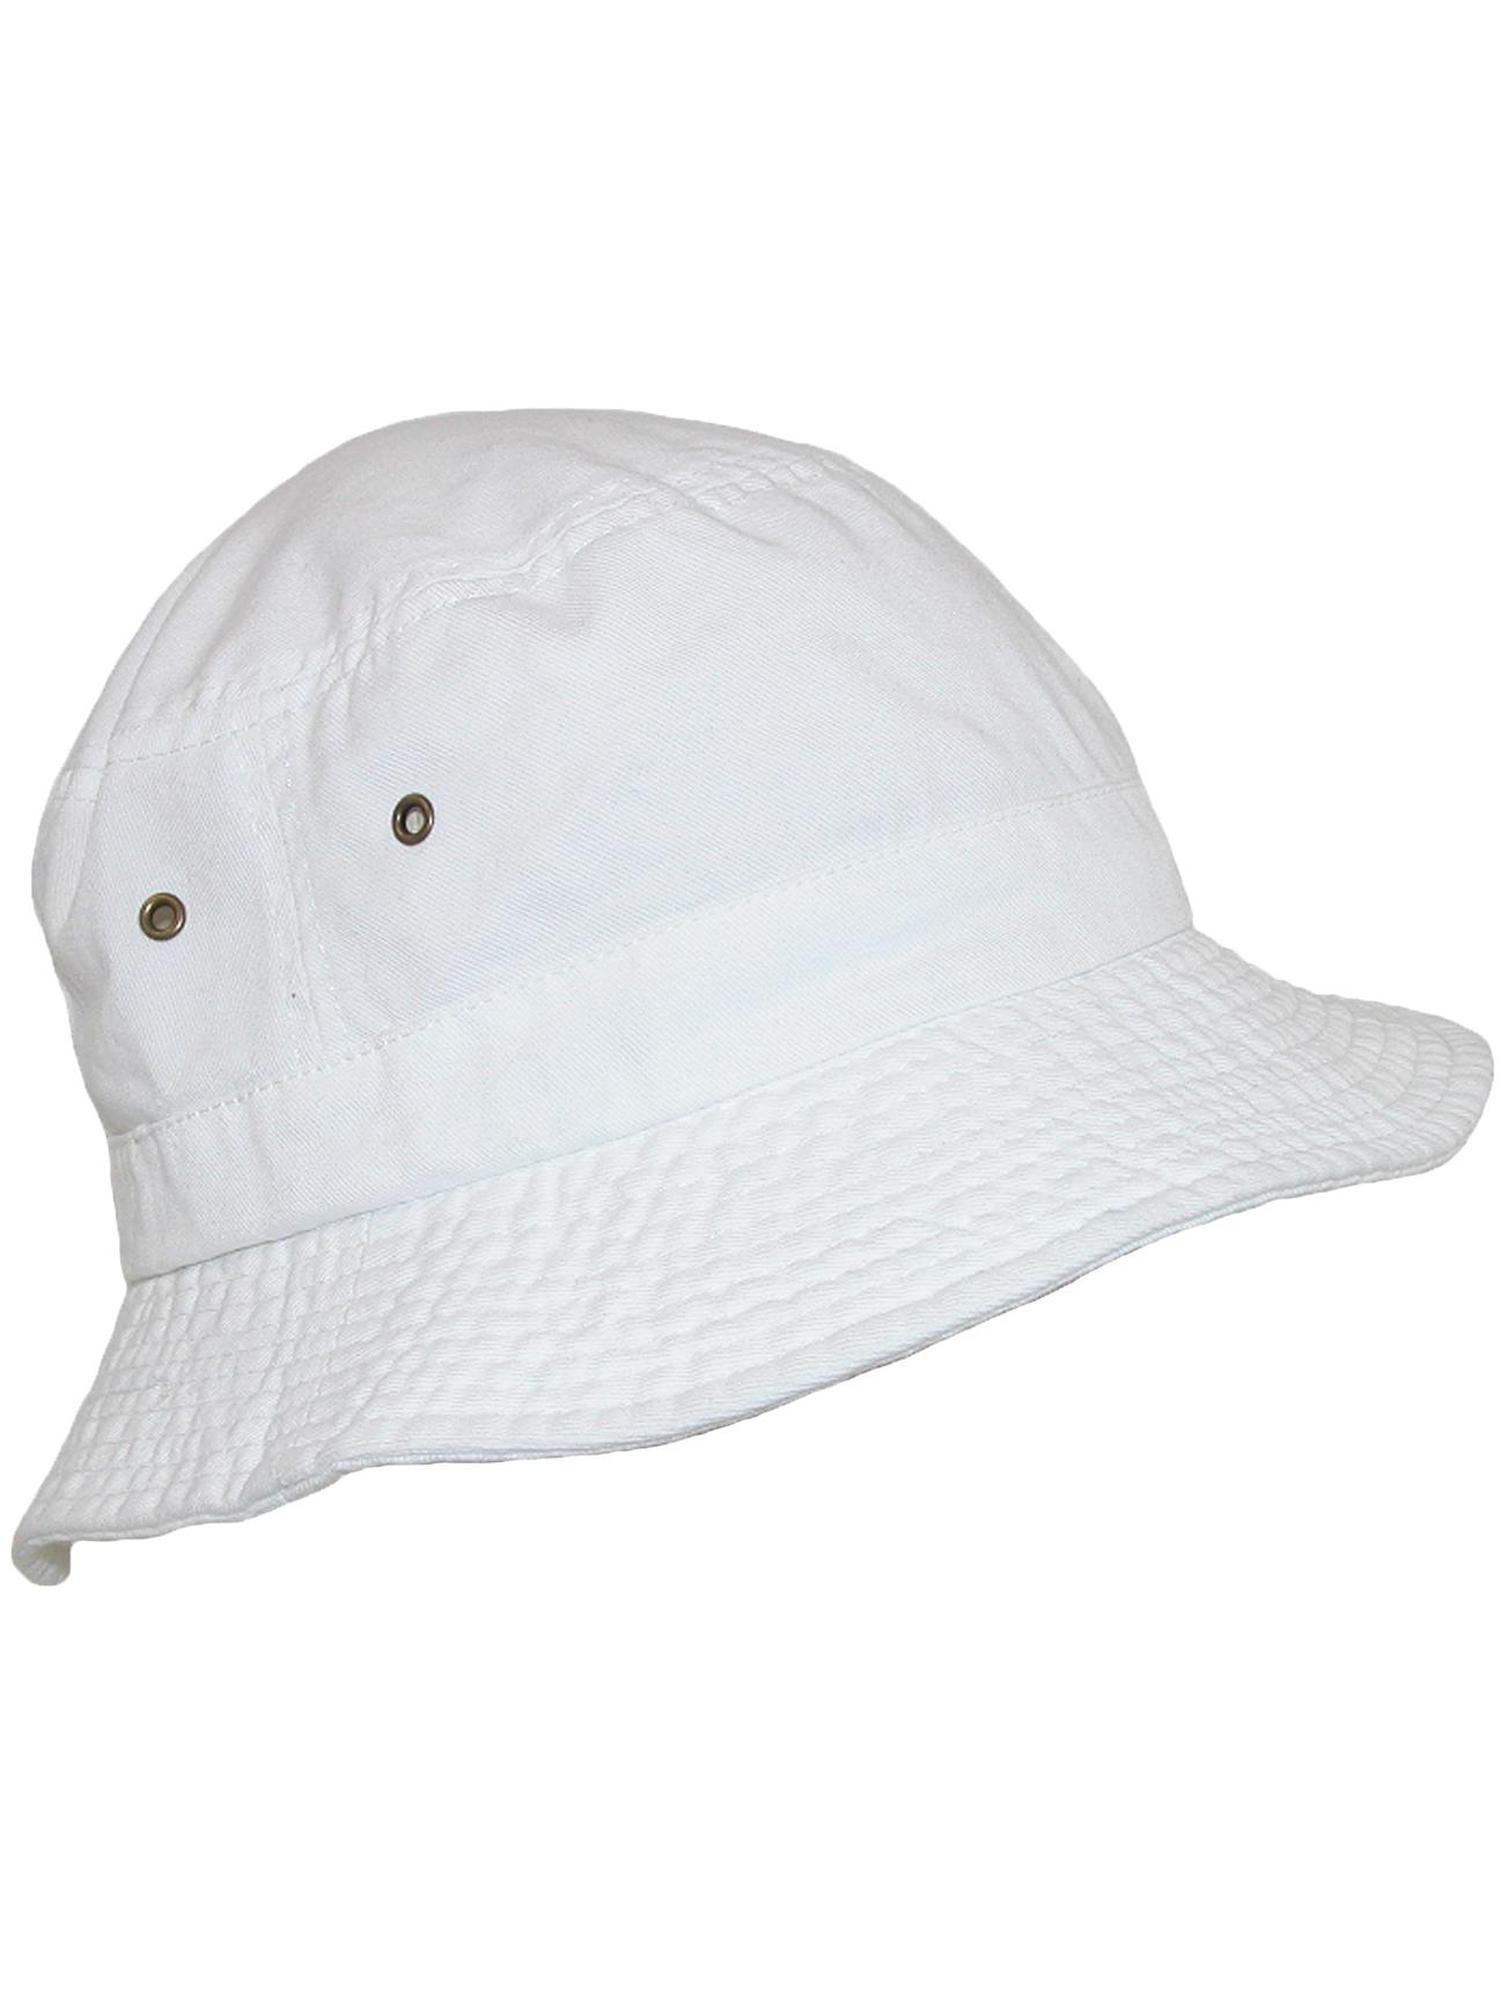 Cotton Big and Tall Summer Bucket Hat 2XL 3XL - Walmart.com 6cddfb3ba53